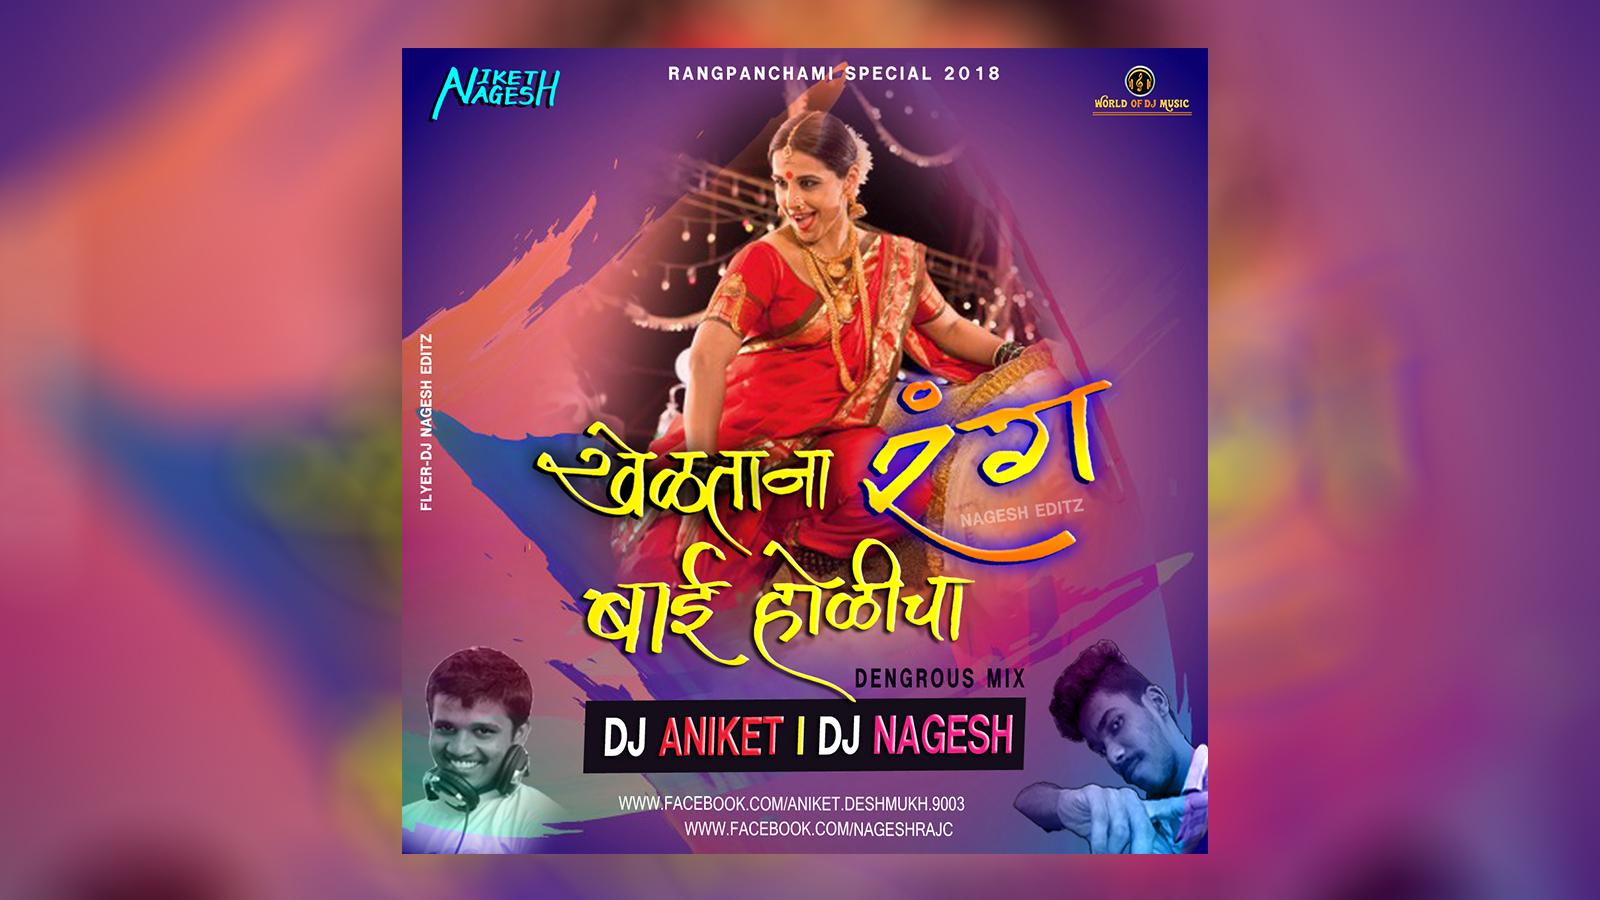 Kheltana Rang Bai (Dangerous Mix) DJ Aniket & Nagesh